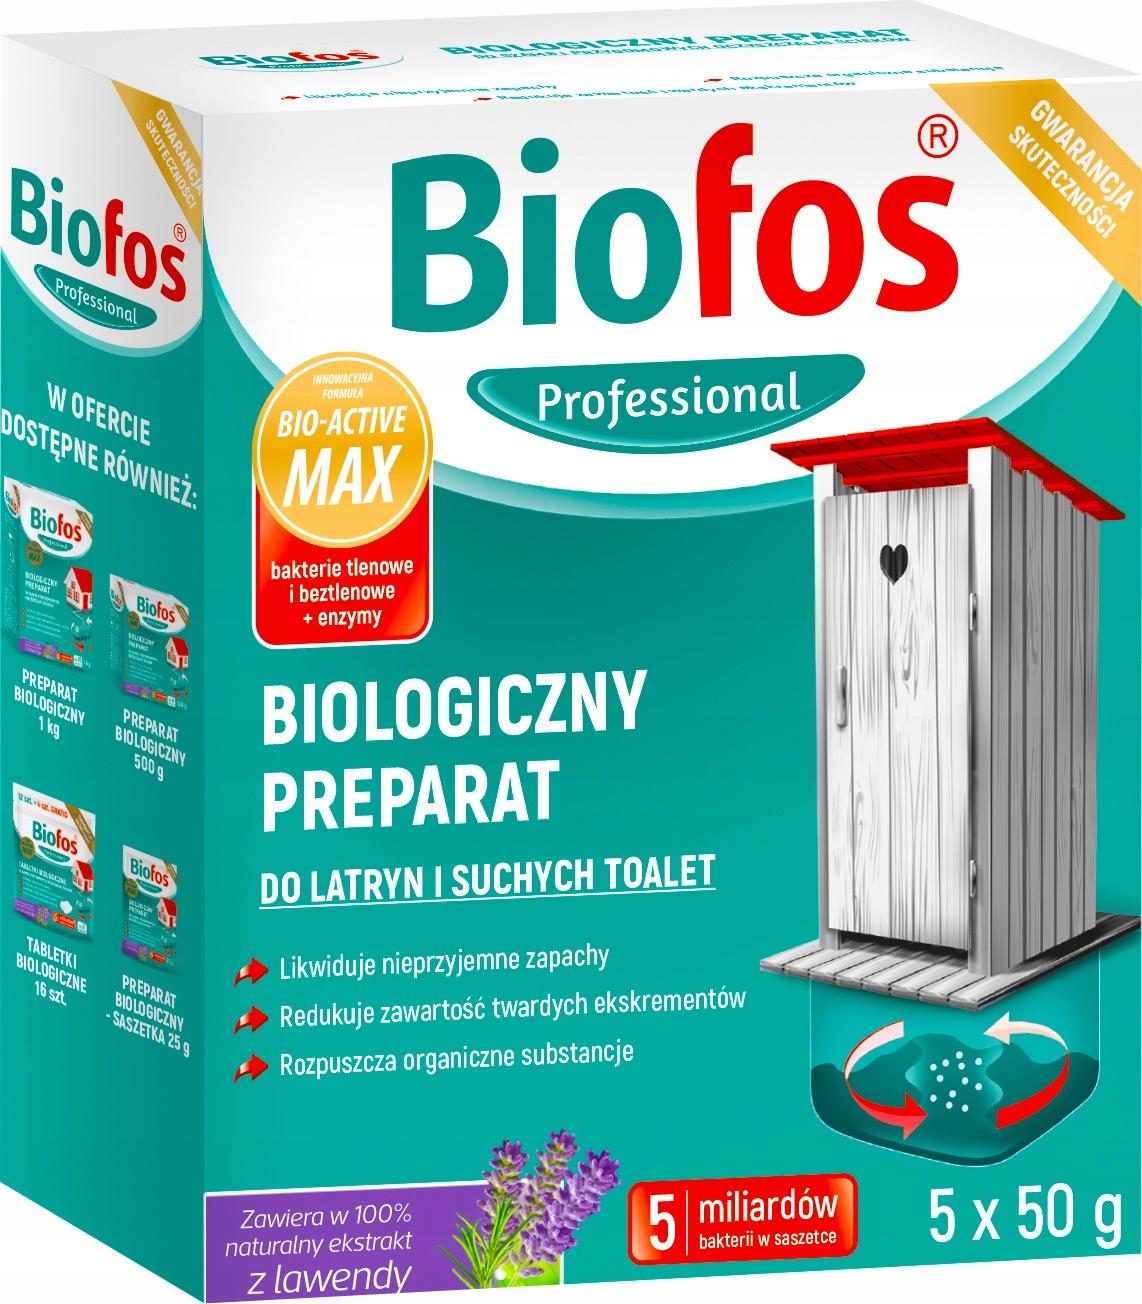 BIOFOS бактерии для туалетов и сухих туалетов 250г